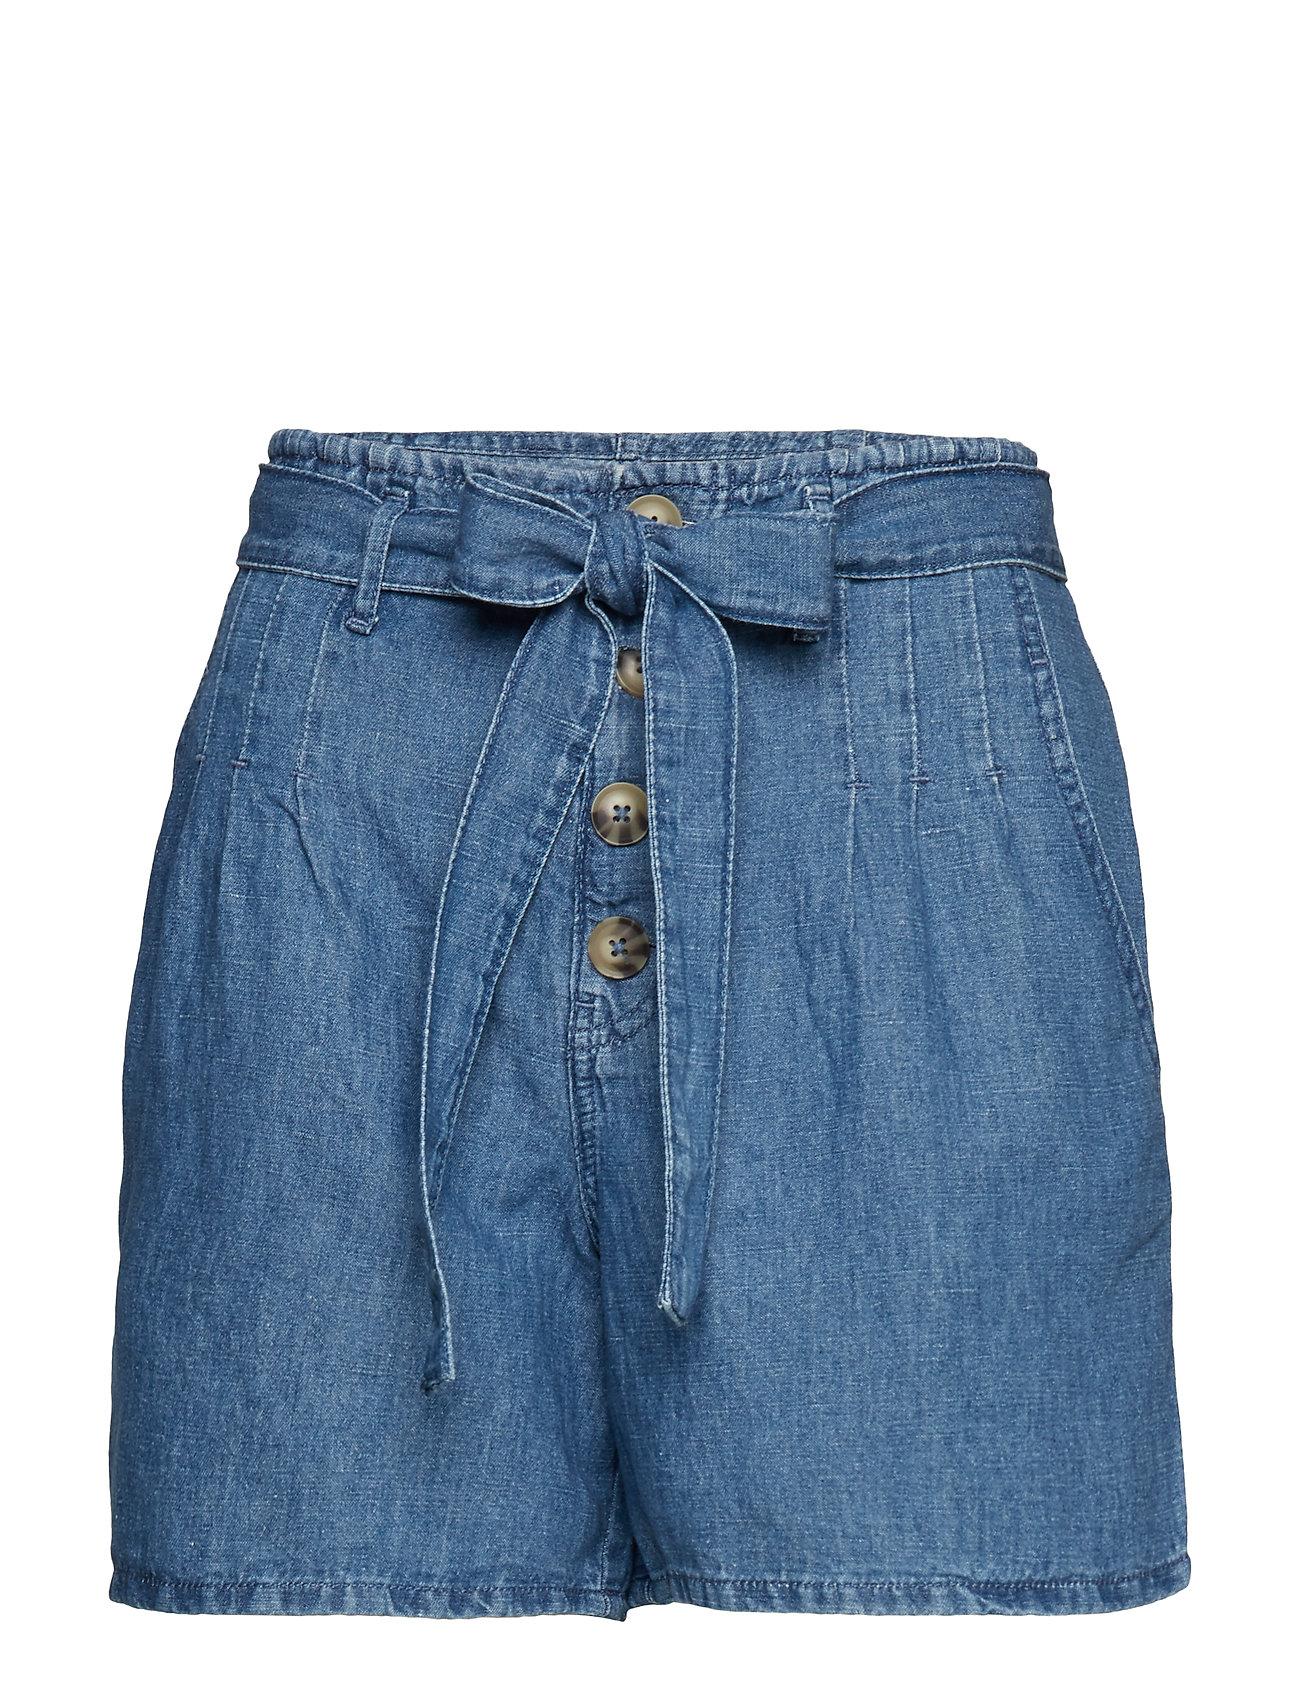 Esprit Casual Shorts denim - BLUE MEDIUM WASH